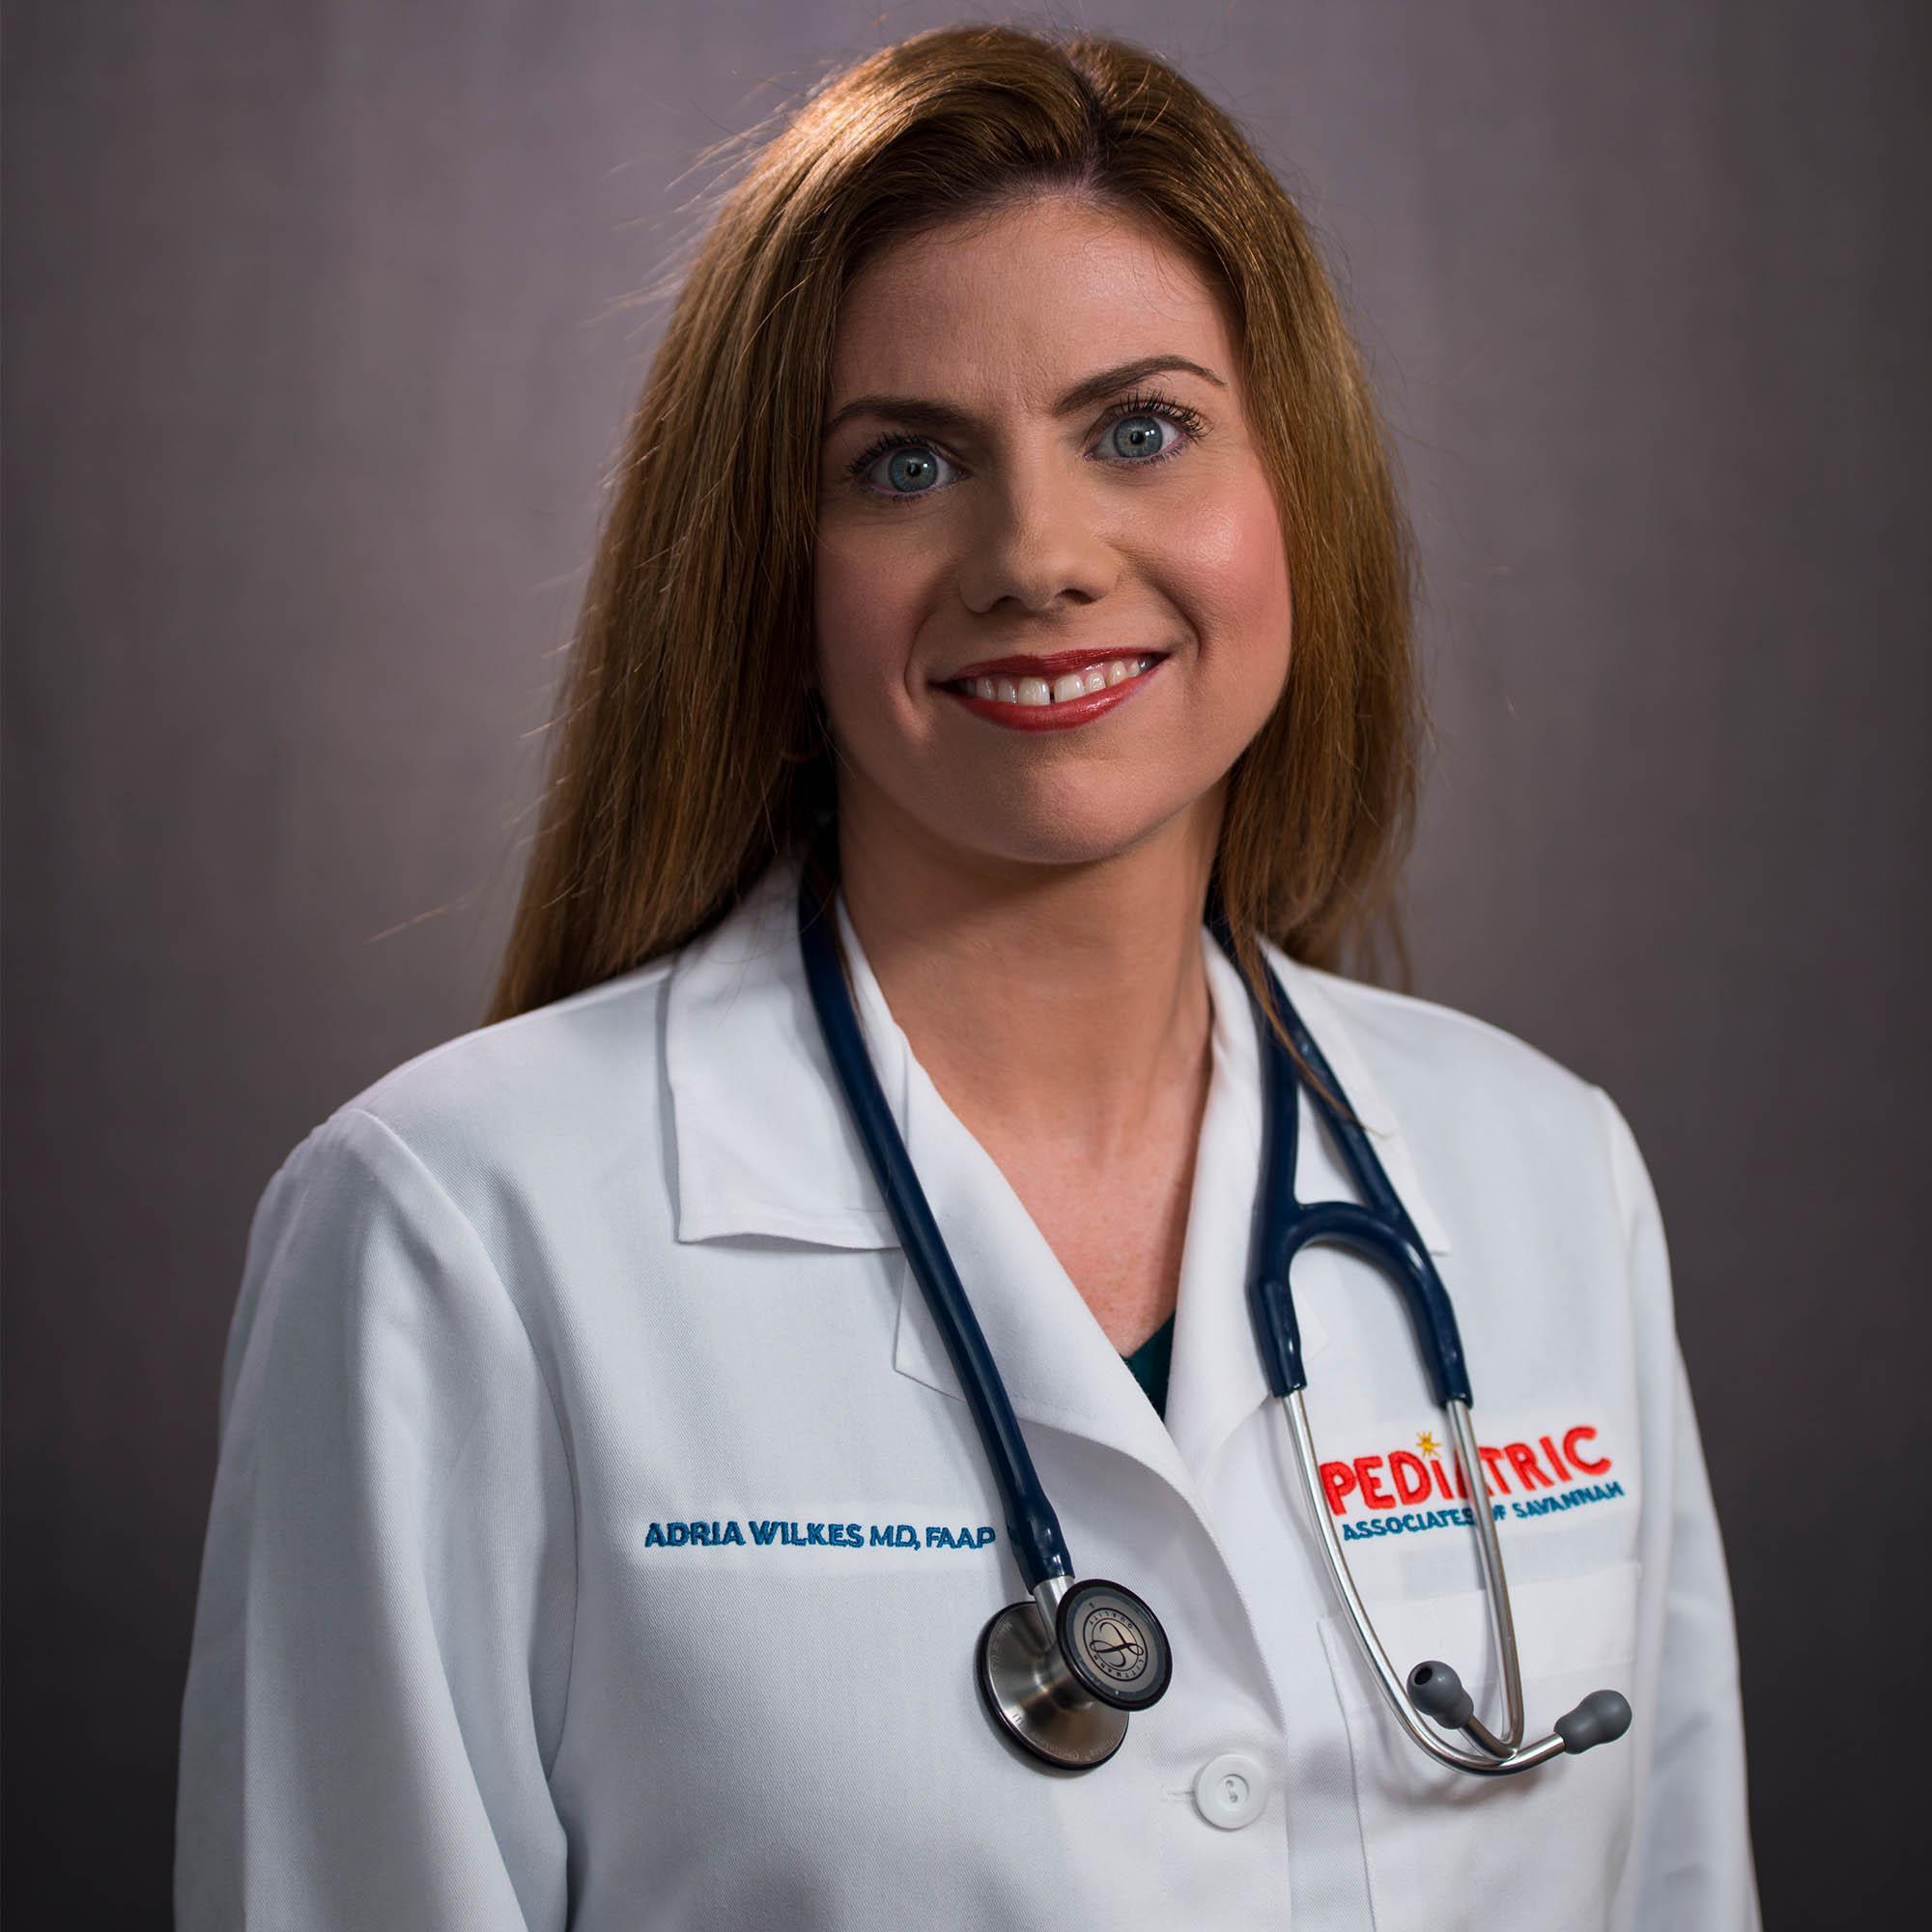 Dr. Adria H. Wilkes